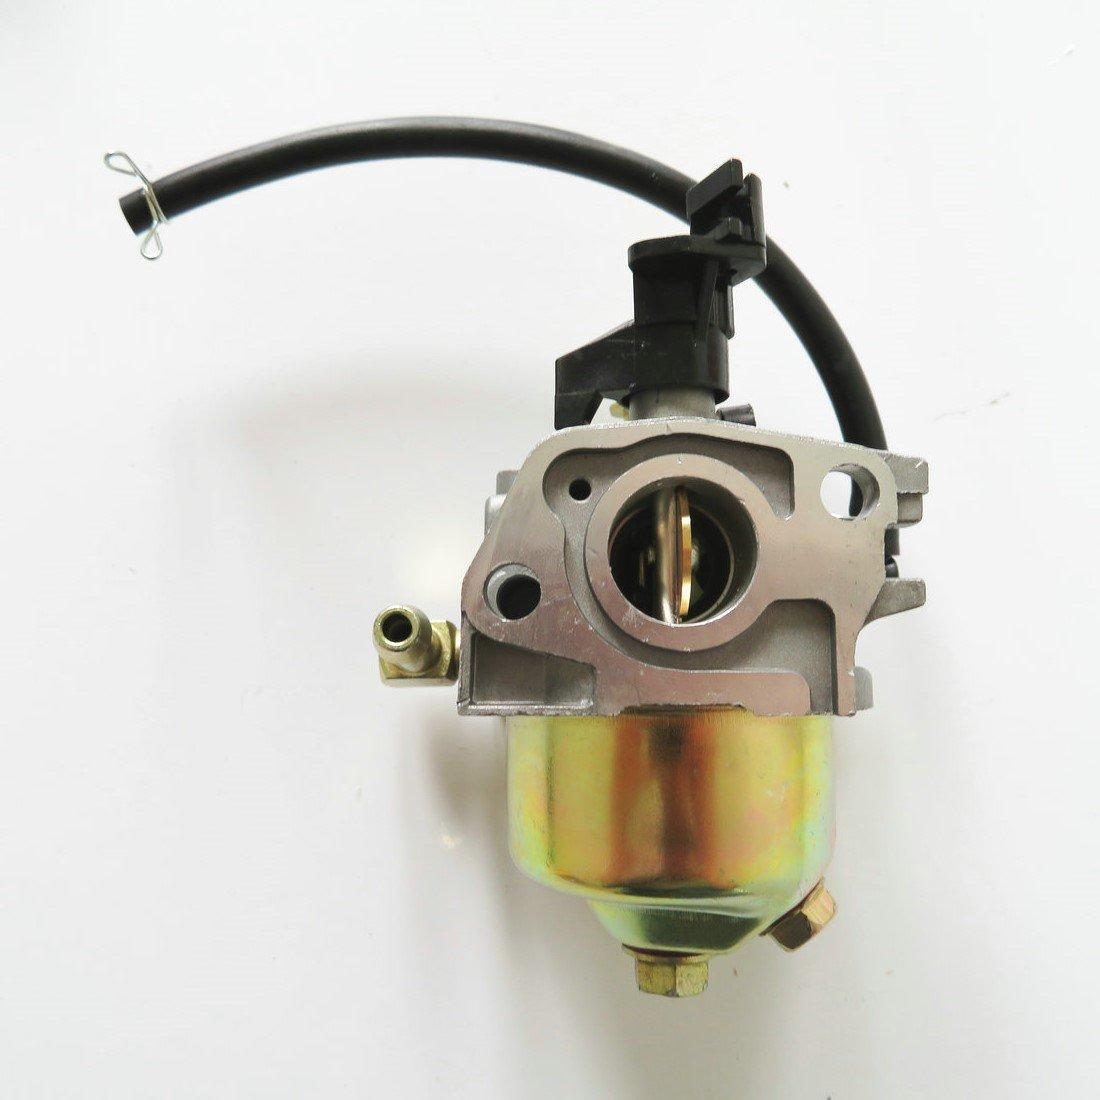 Carburetor For Mtd Cub Cadet Troy Bilt 751 10881 951 Genuine Oem Troybilt 7531225 X3 Garden Outdoor